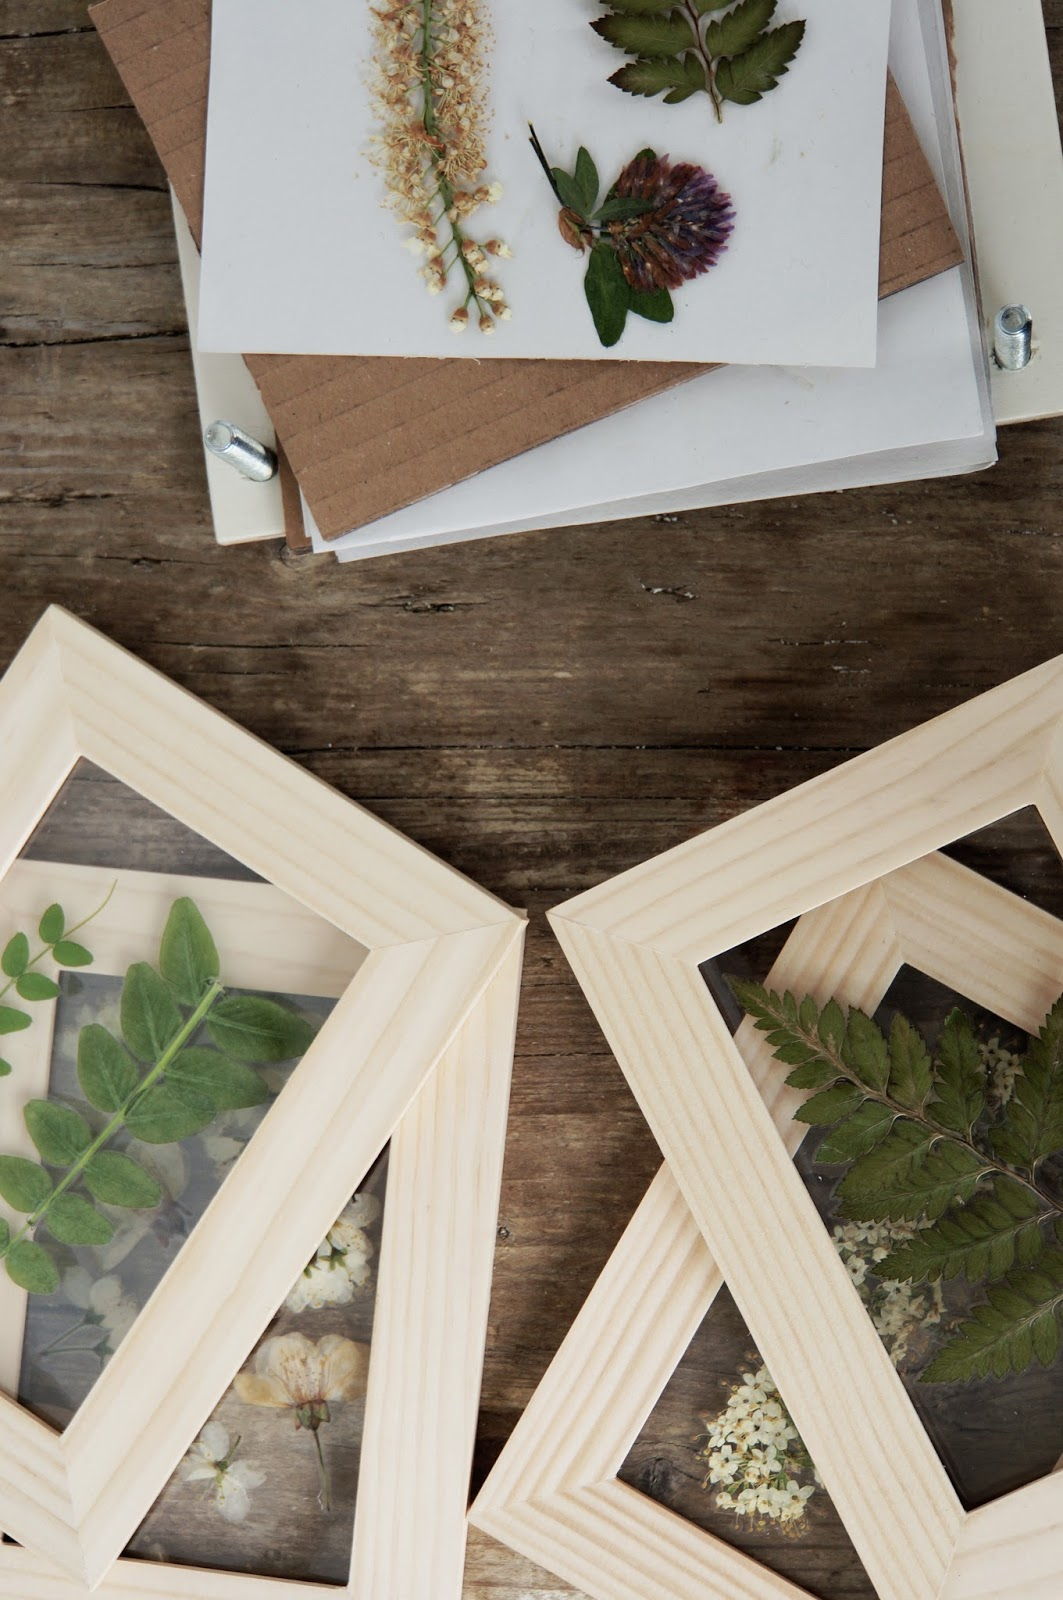 basteln malen Kuchen backen: Blumenbilder